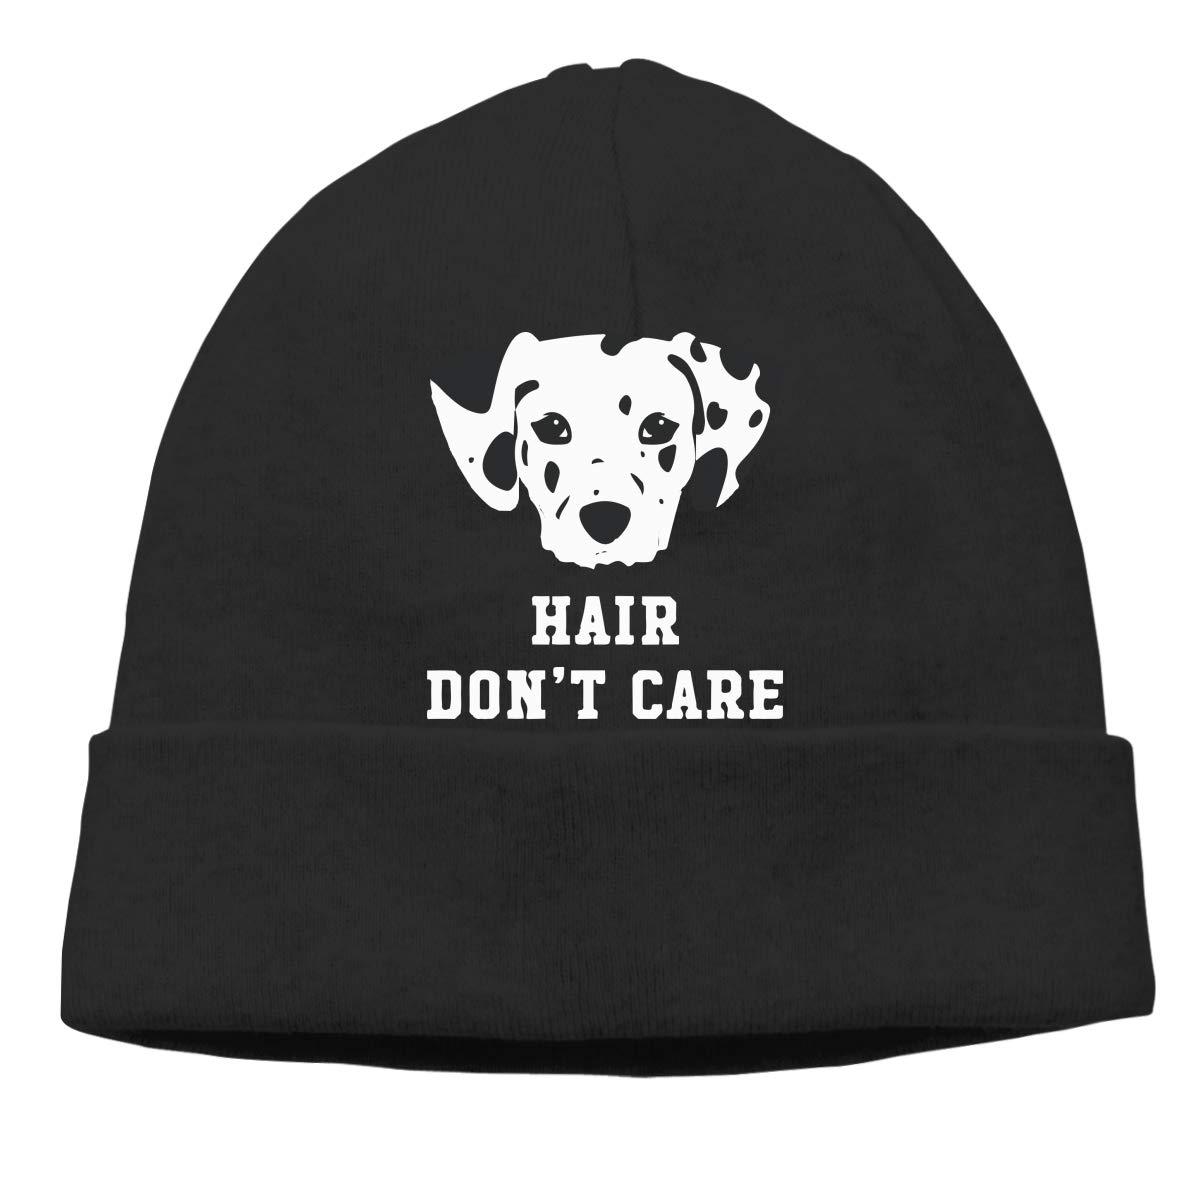 GDSG5/&4 Dalmatian Hair Dont Care Men /& Women Knitting Wool Warm Running Skull Cap